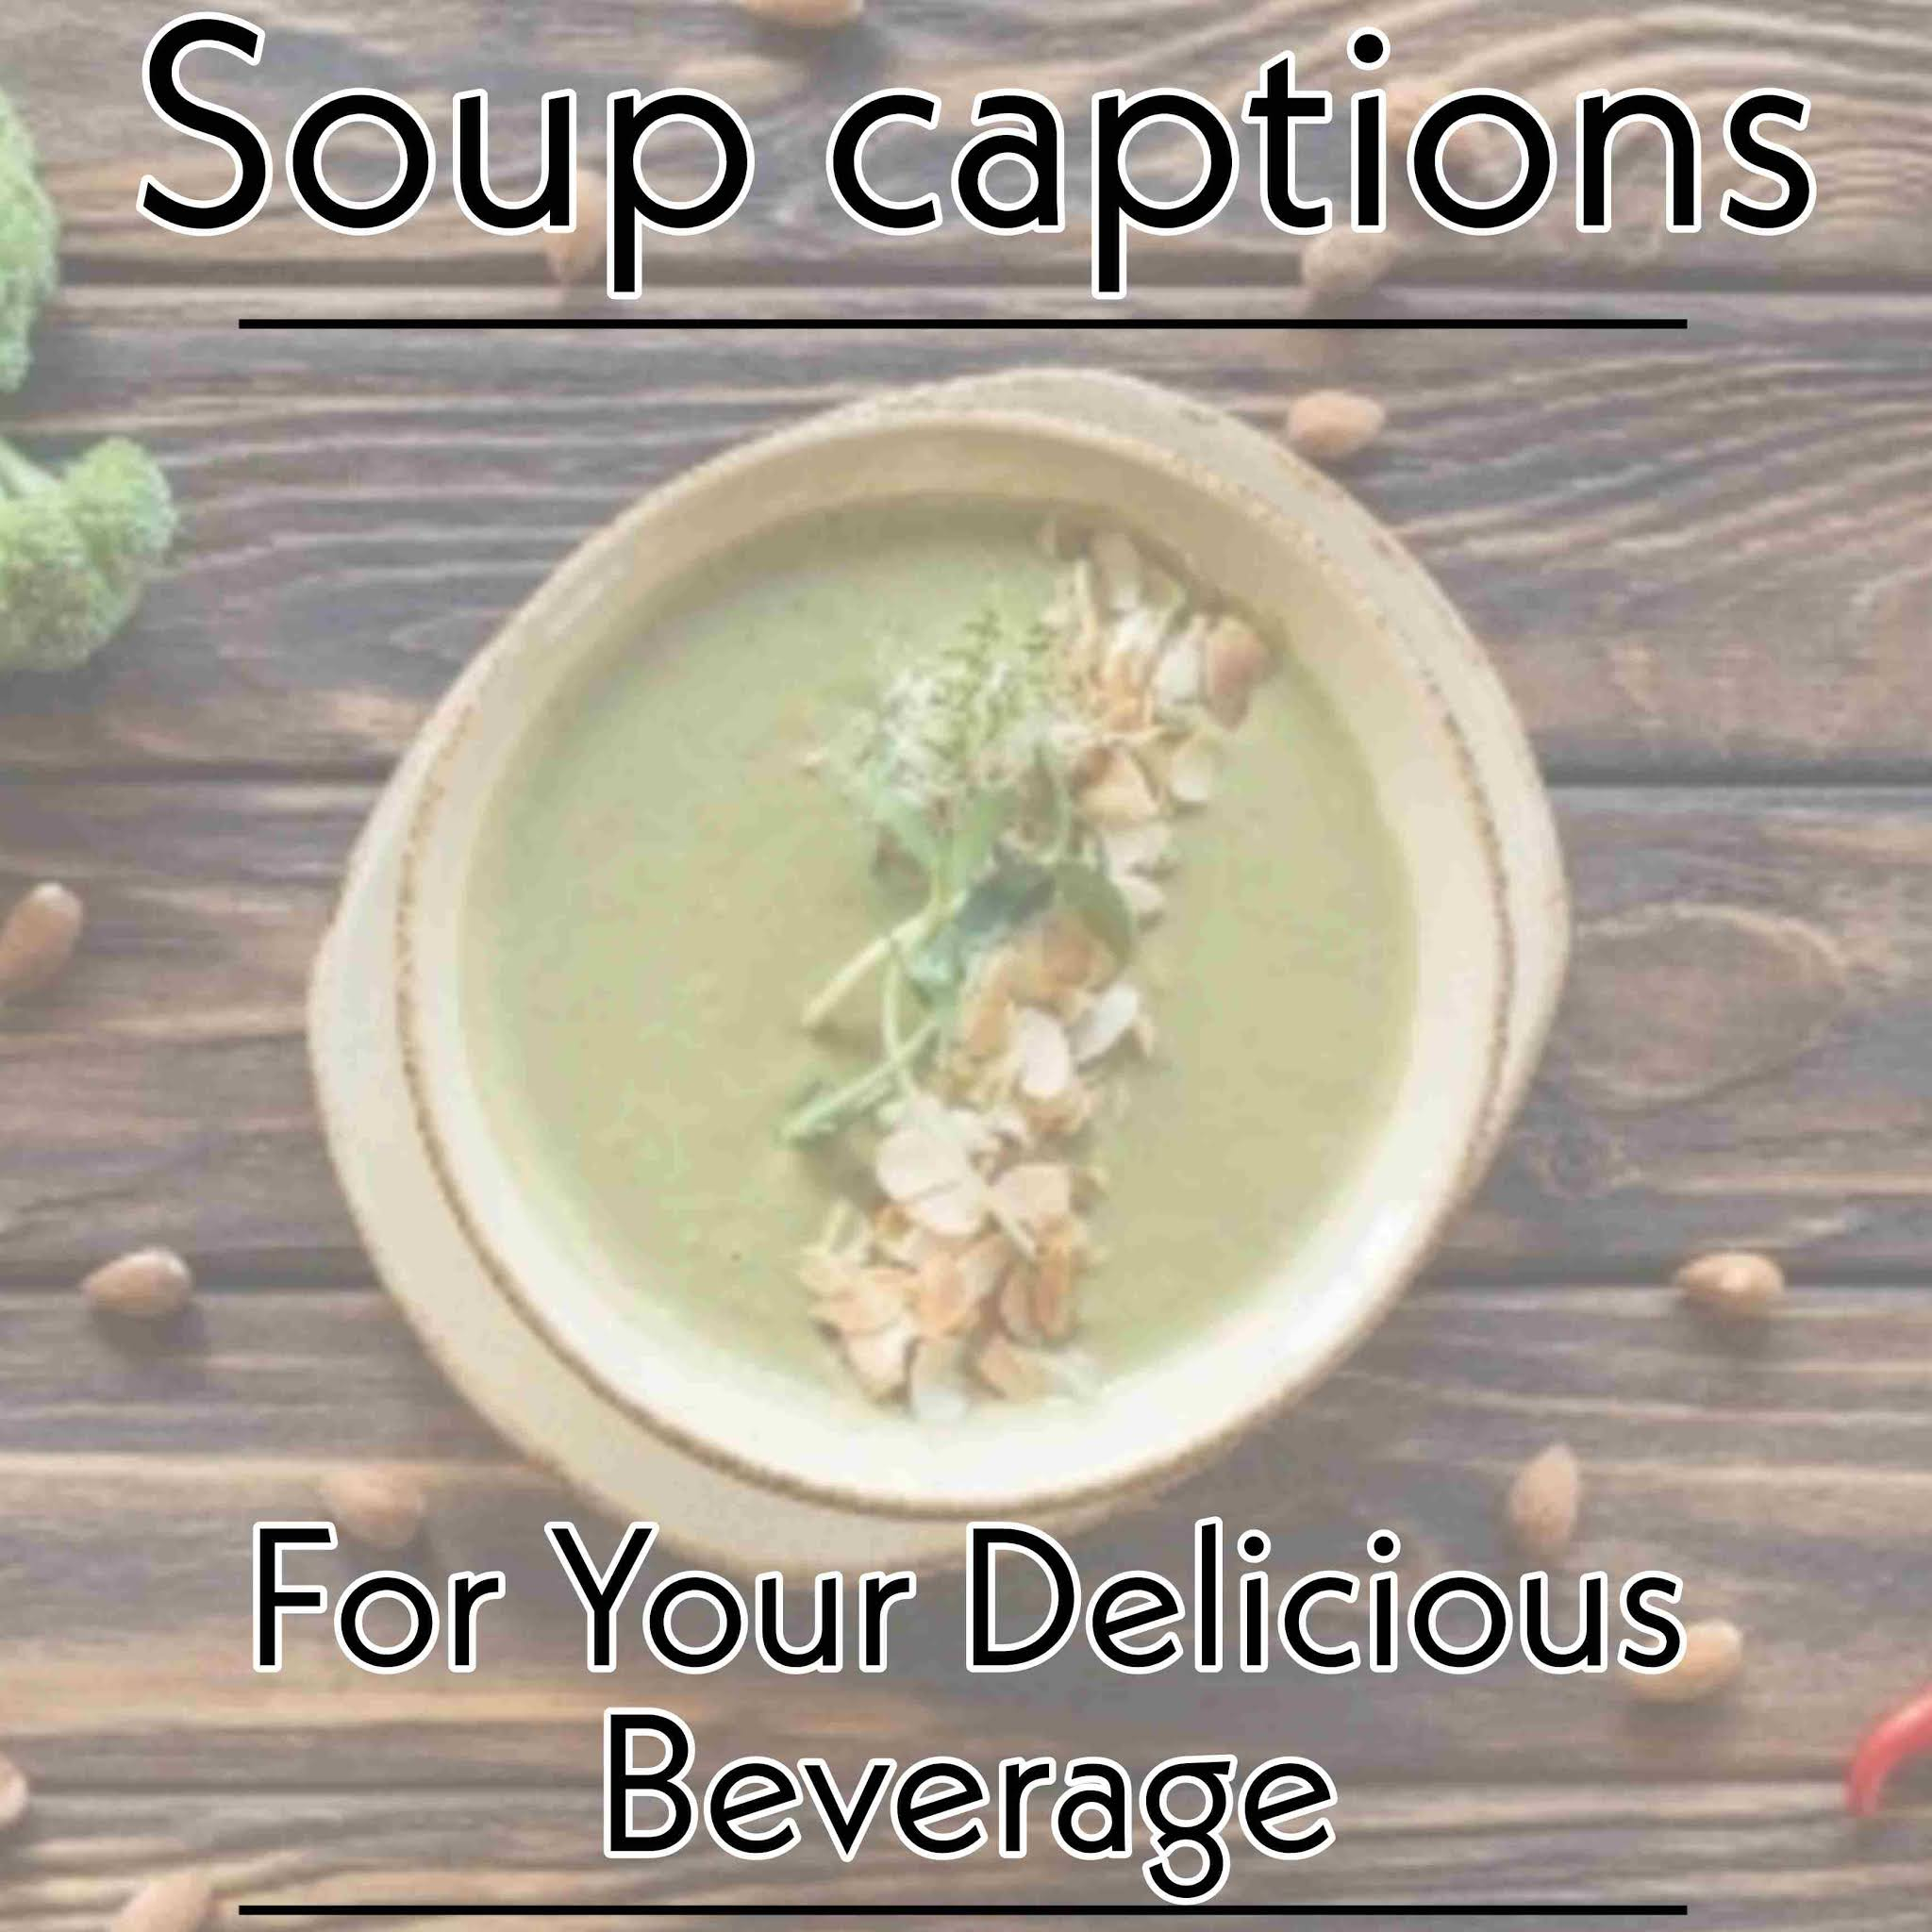 Soup captions for Instagram, Tomato Soup captions, Winter Soup captions, Chicken Soup captions